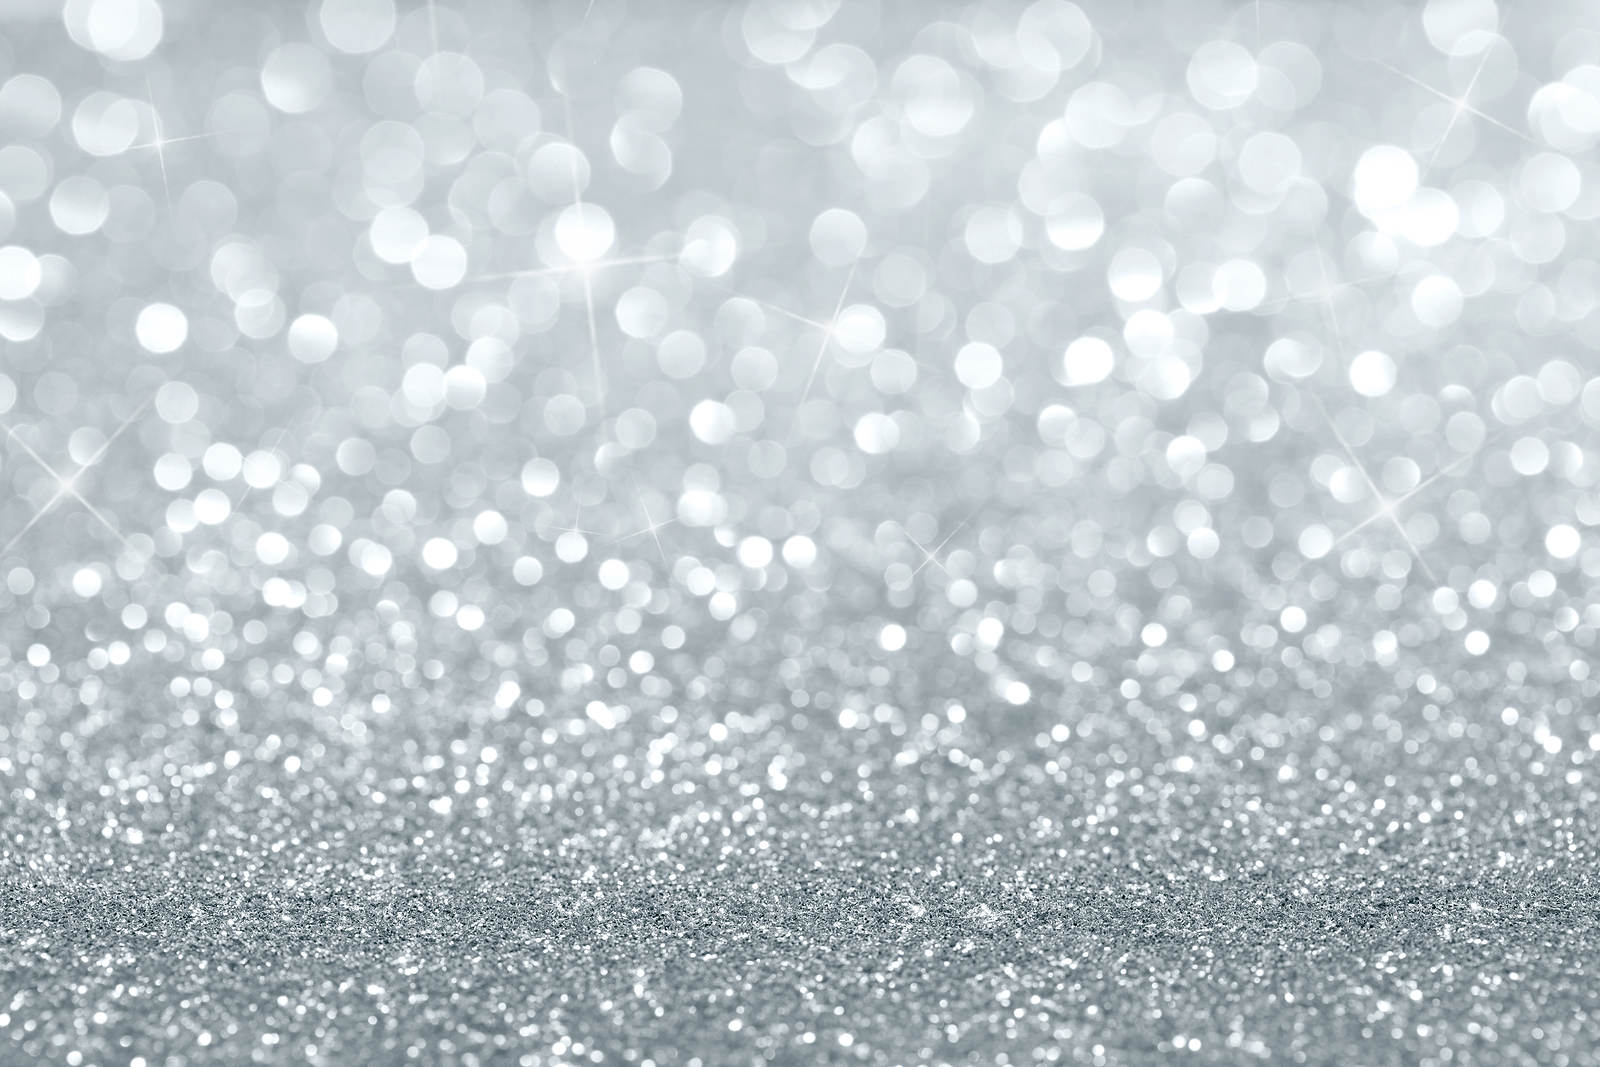 10 Silver Glitter Backgrounds Wallpapers FreeCreatives 1600x1067